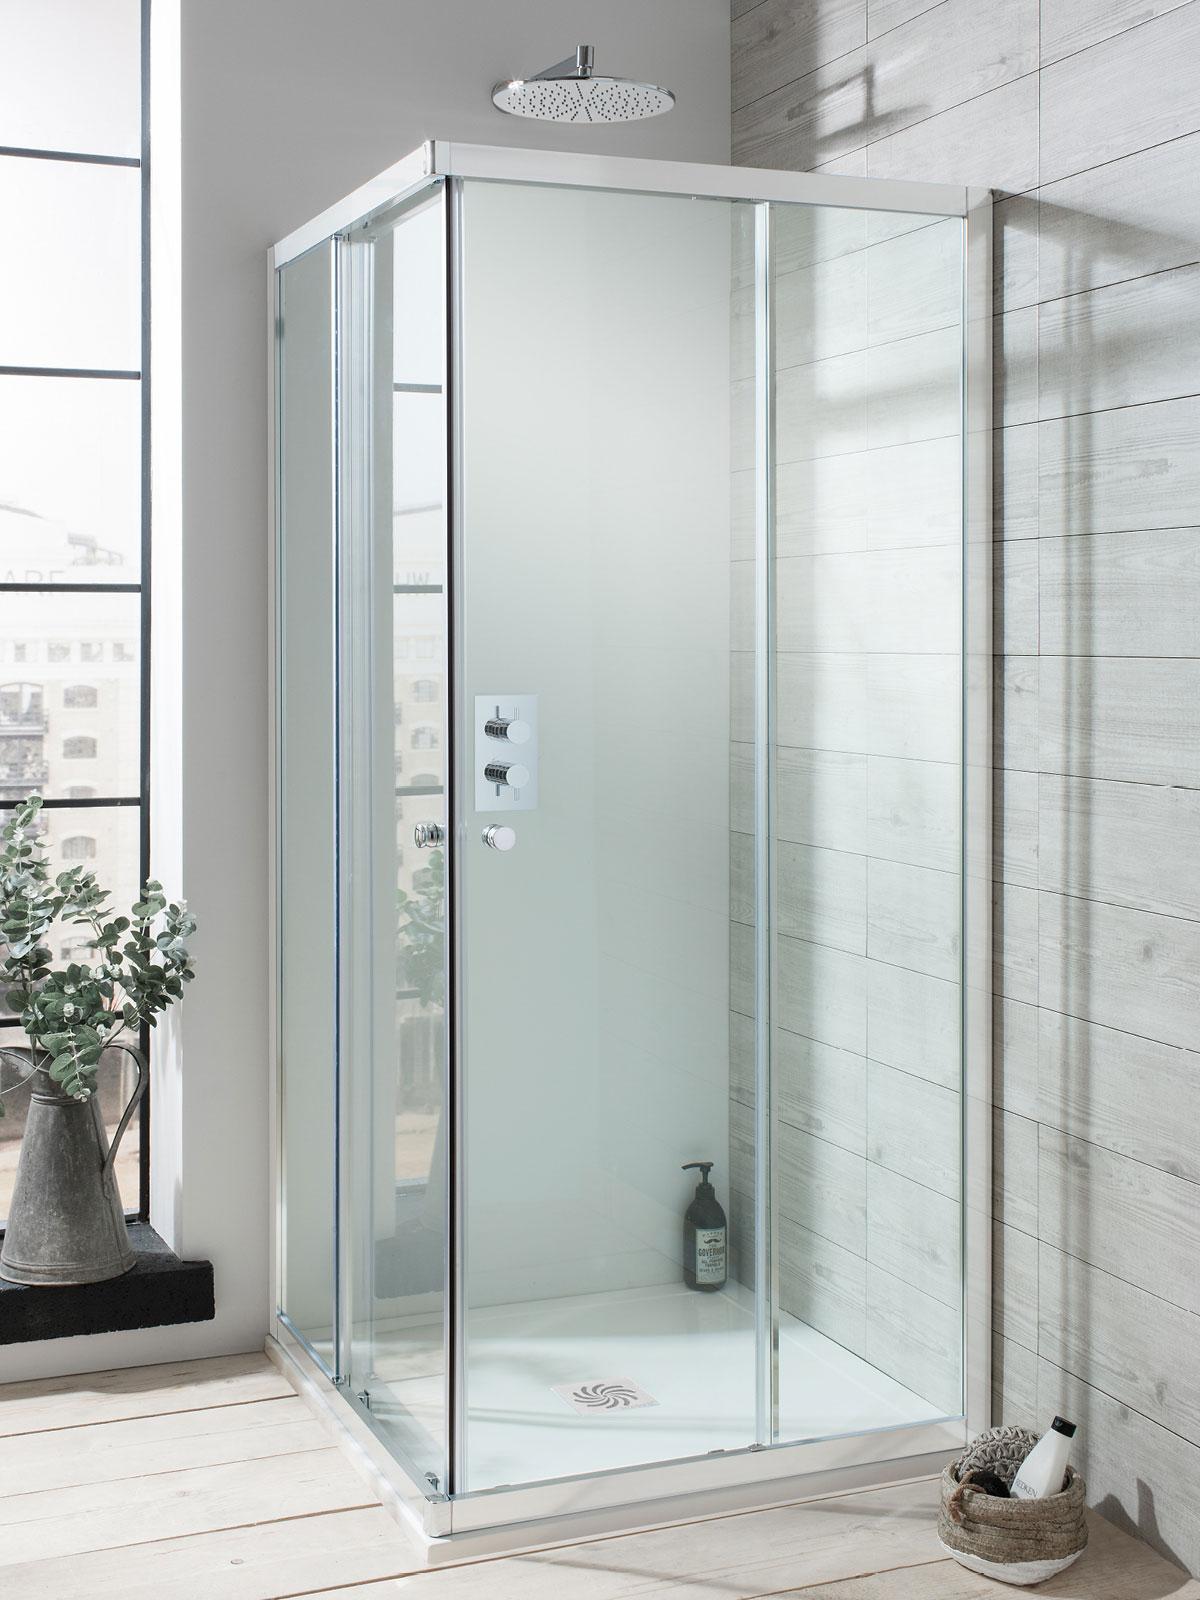 Edge Corner Entry Shower Enclosure in Edge | Luxury bathrooms UK ...